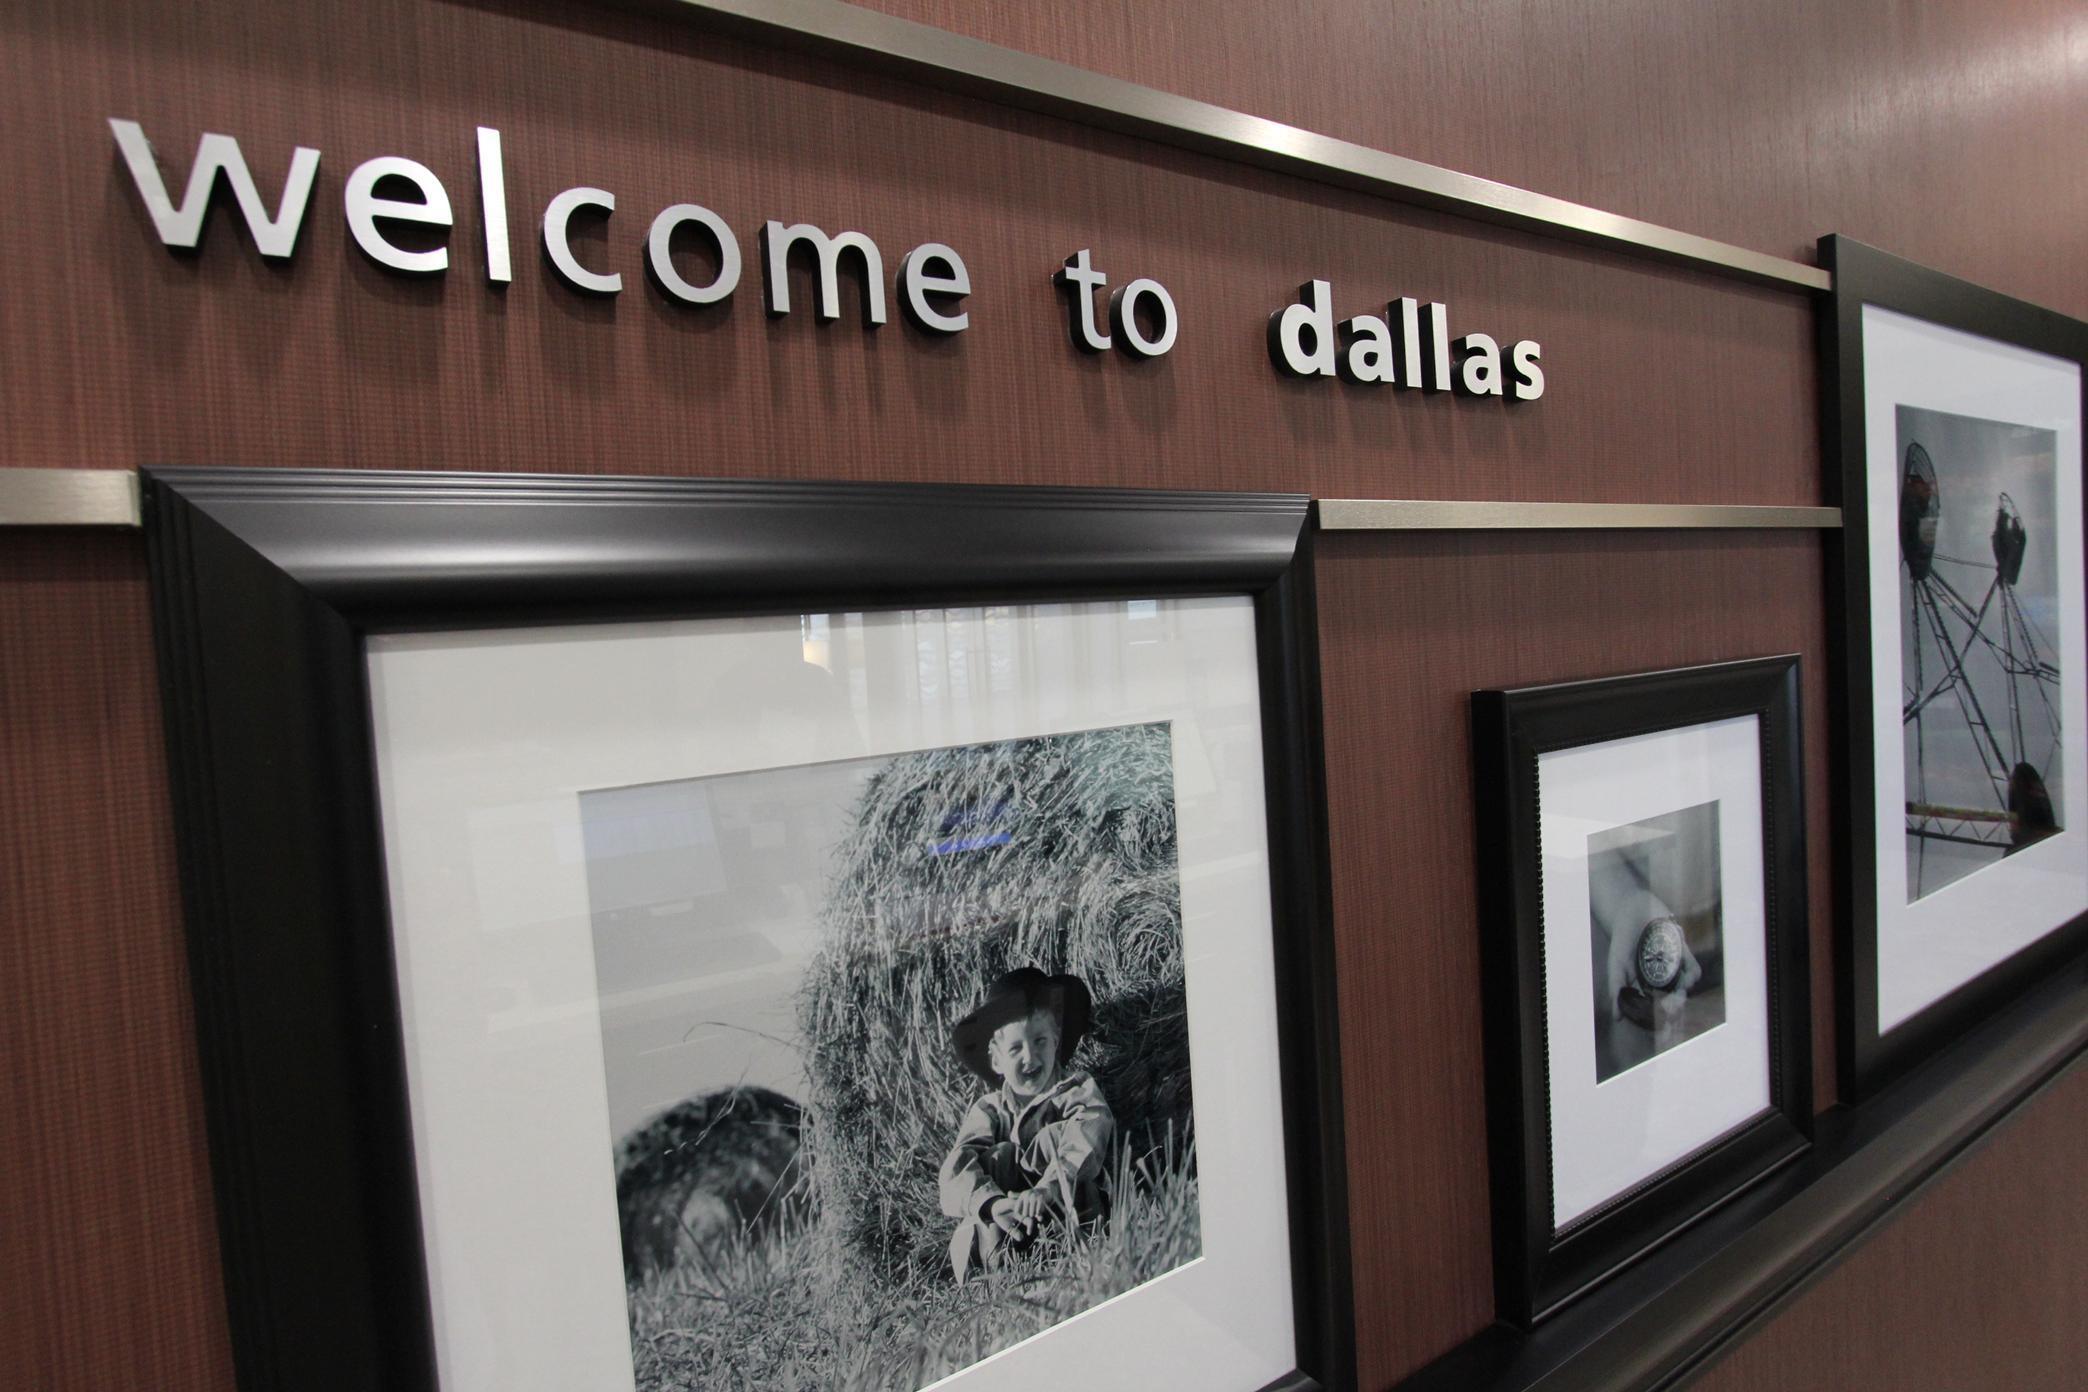 Hampton Inn & Suites Dallas Market Center